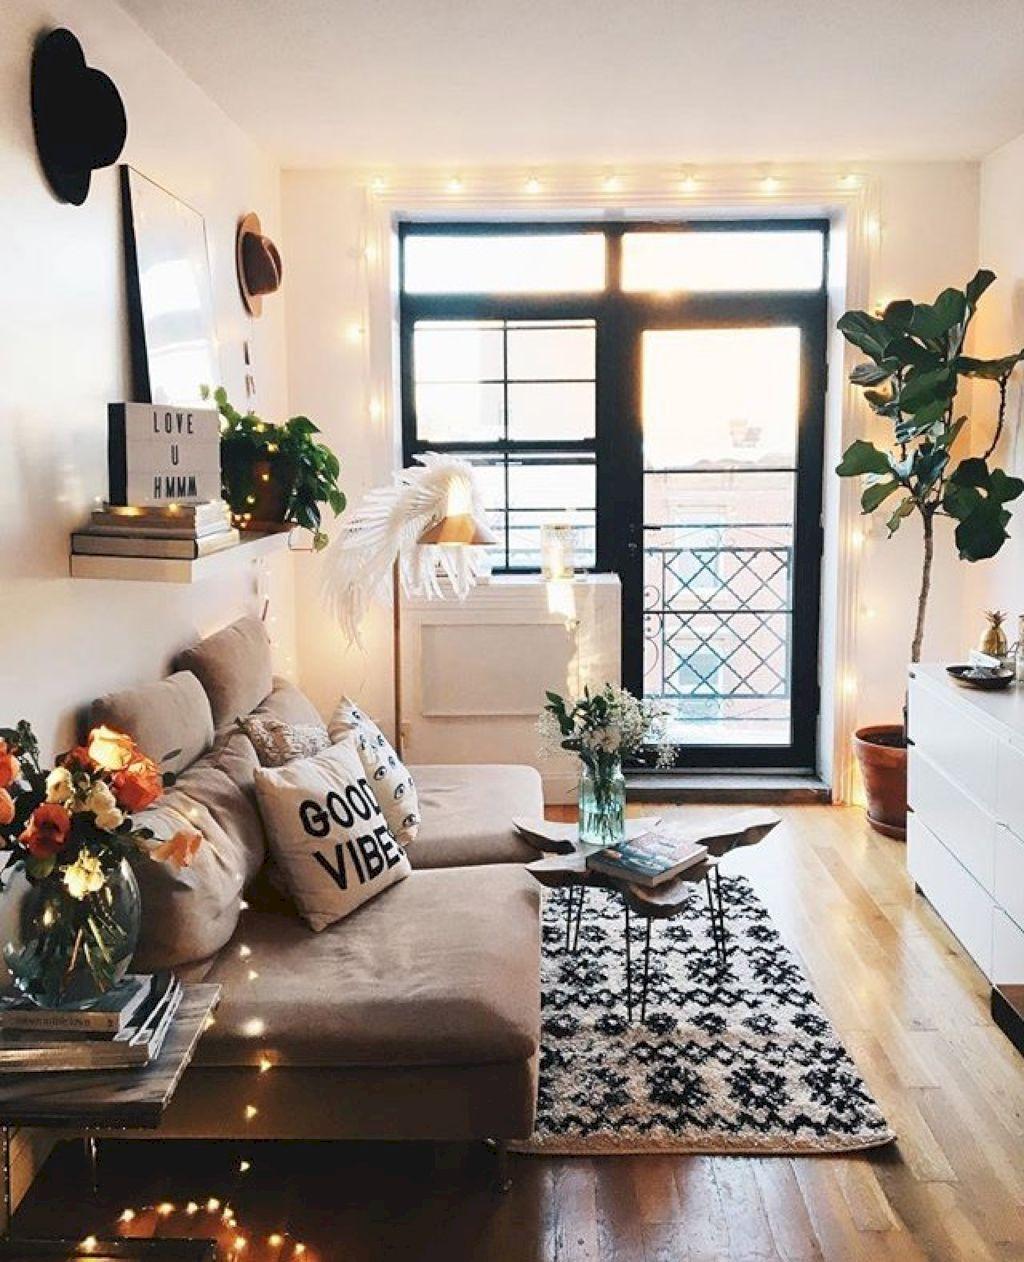 40 cozy small living room apartment ideas | living room